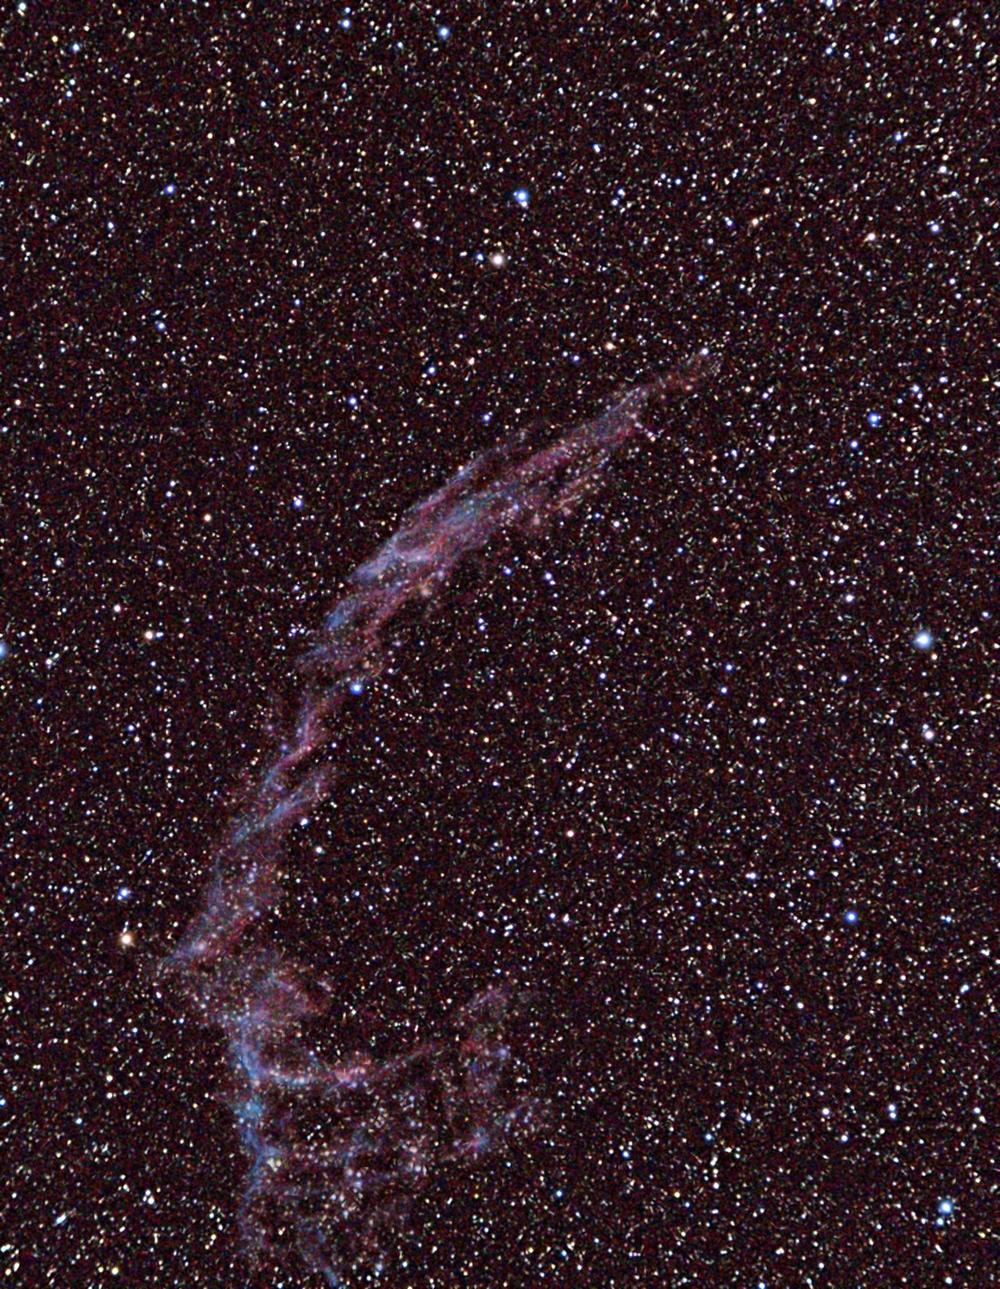 Veil Nebula (East, NGC 6992, 6995)